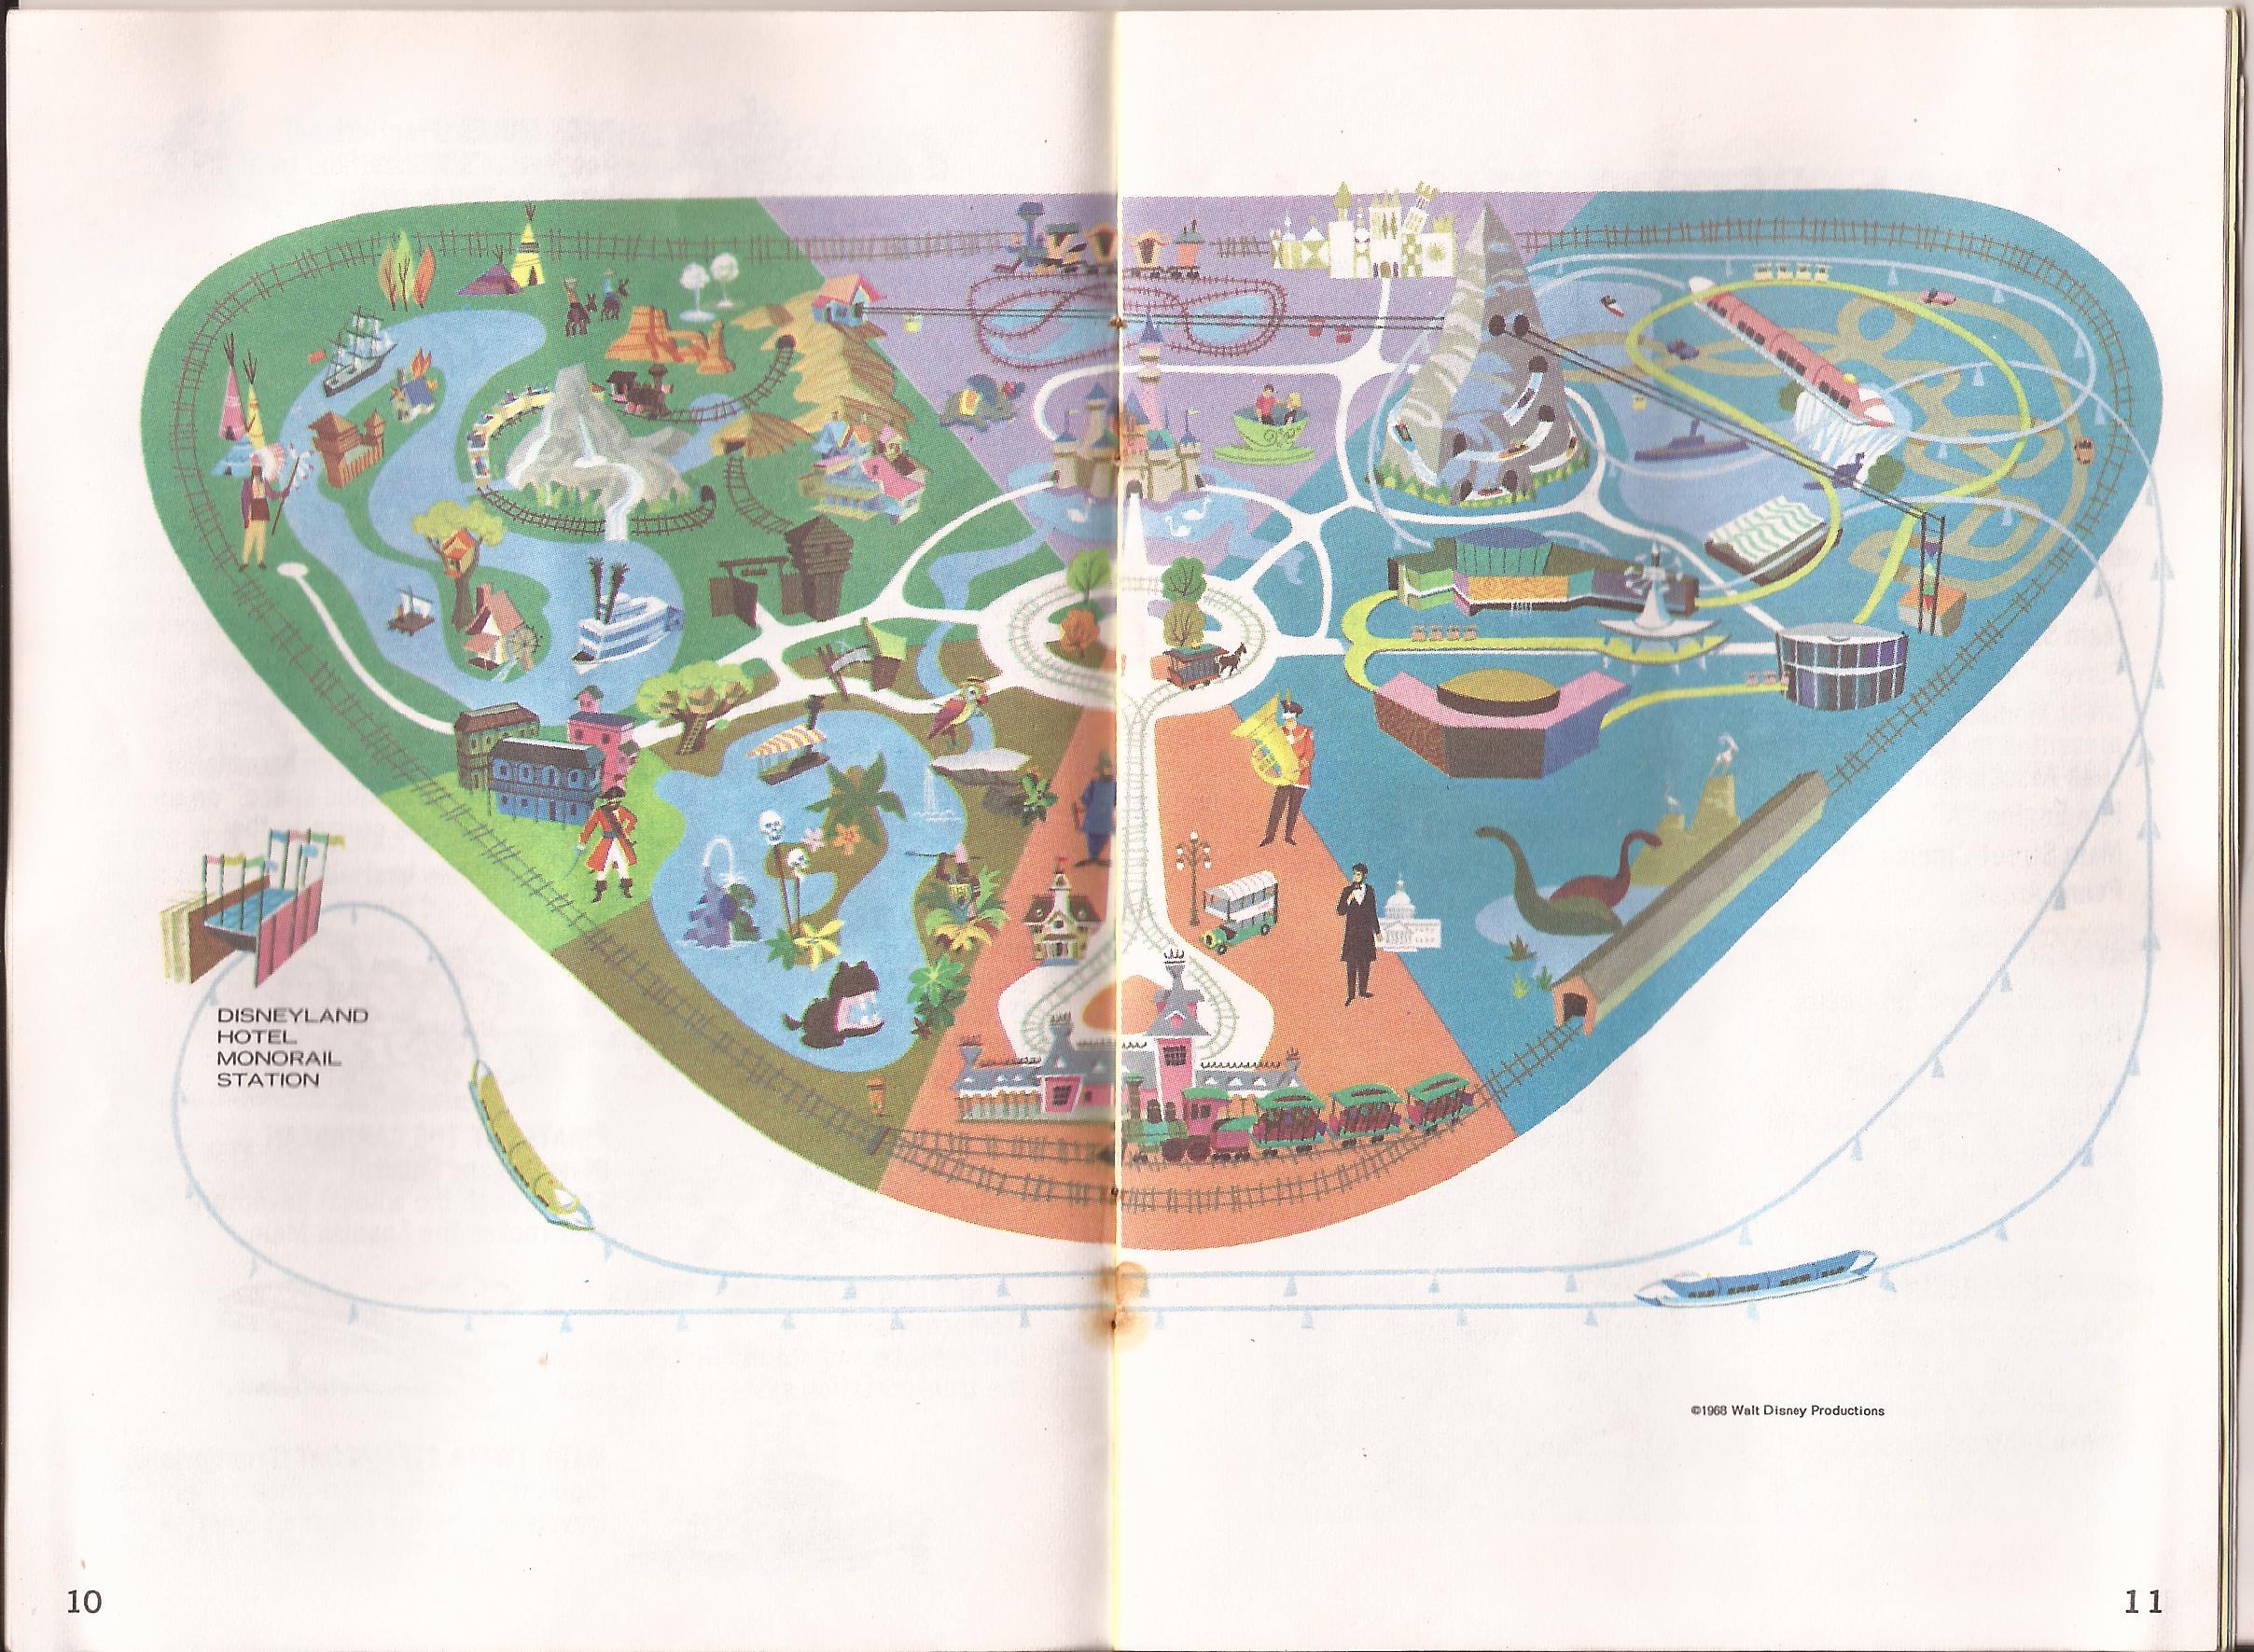 1968 Disneyland Guide and Map - Coaster101 on disneyland hotel map, tomorrowland map, 1981 disneyland map, theme park map, printable disneyland map, tokyo disneyland map, disneyland transportation map, epcot map, original disneyland map, six flags great america map, disneyland florida map, disneyland area map, disney map, animal kingdom map, disneyland parade map, tokyo disneysea map, disneyland parking lot map, magic kingdom map, universal studios map, hong kong disneyland map,